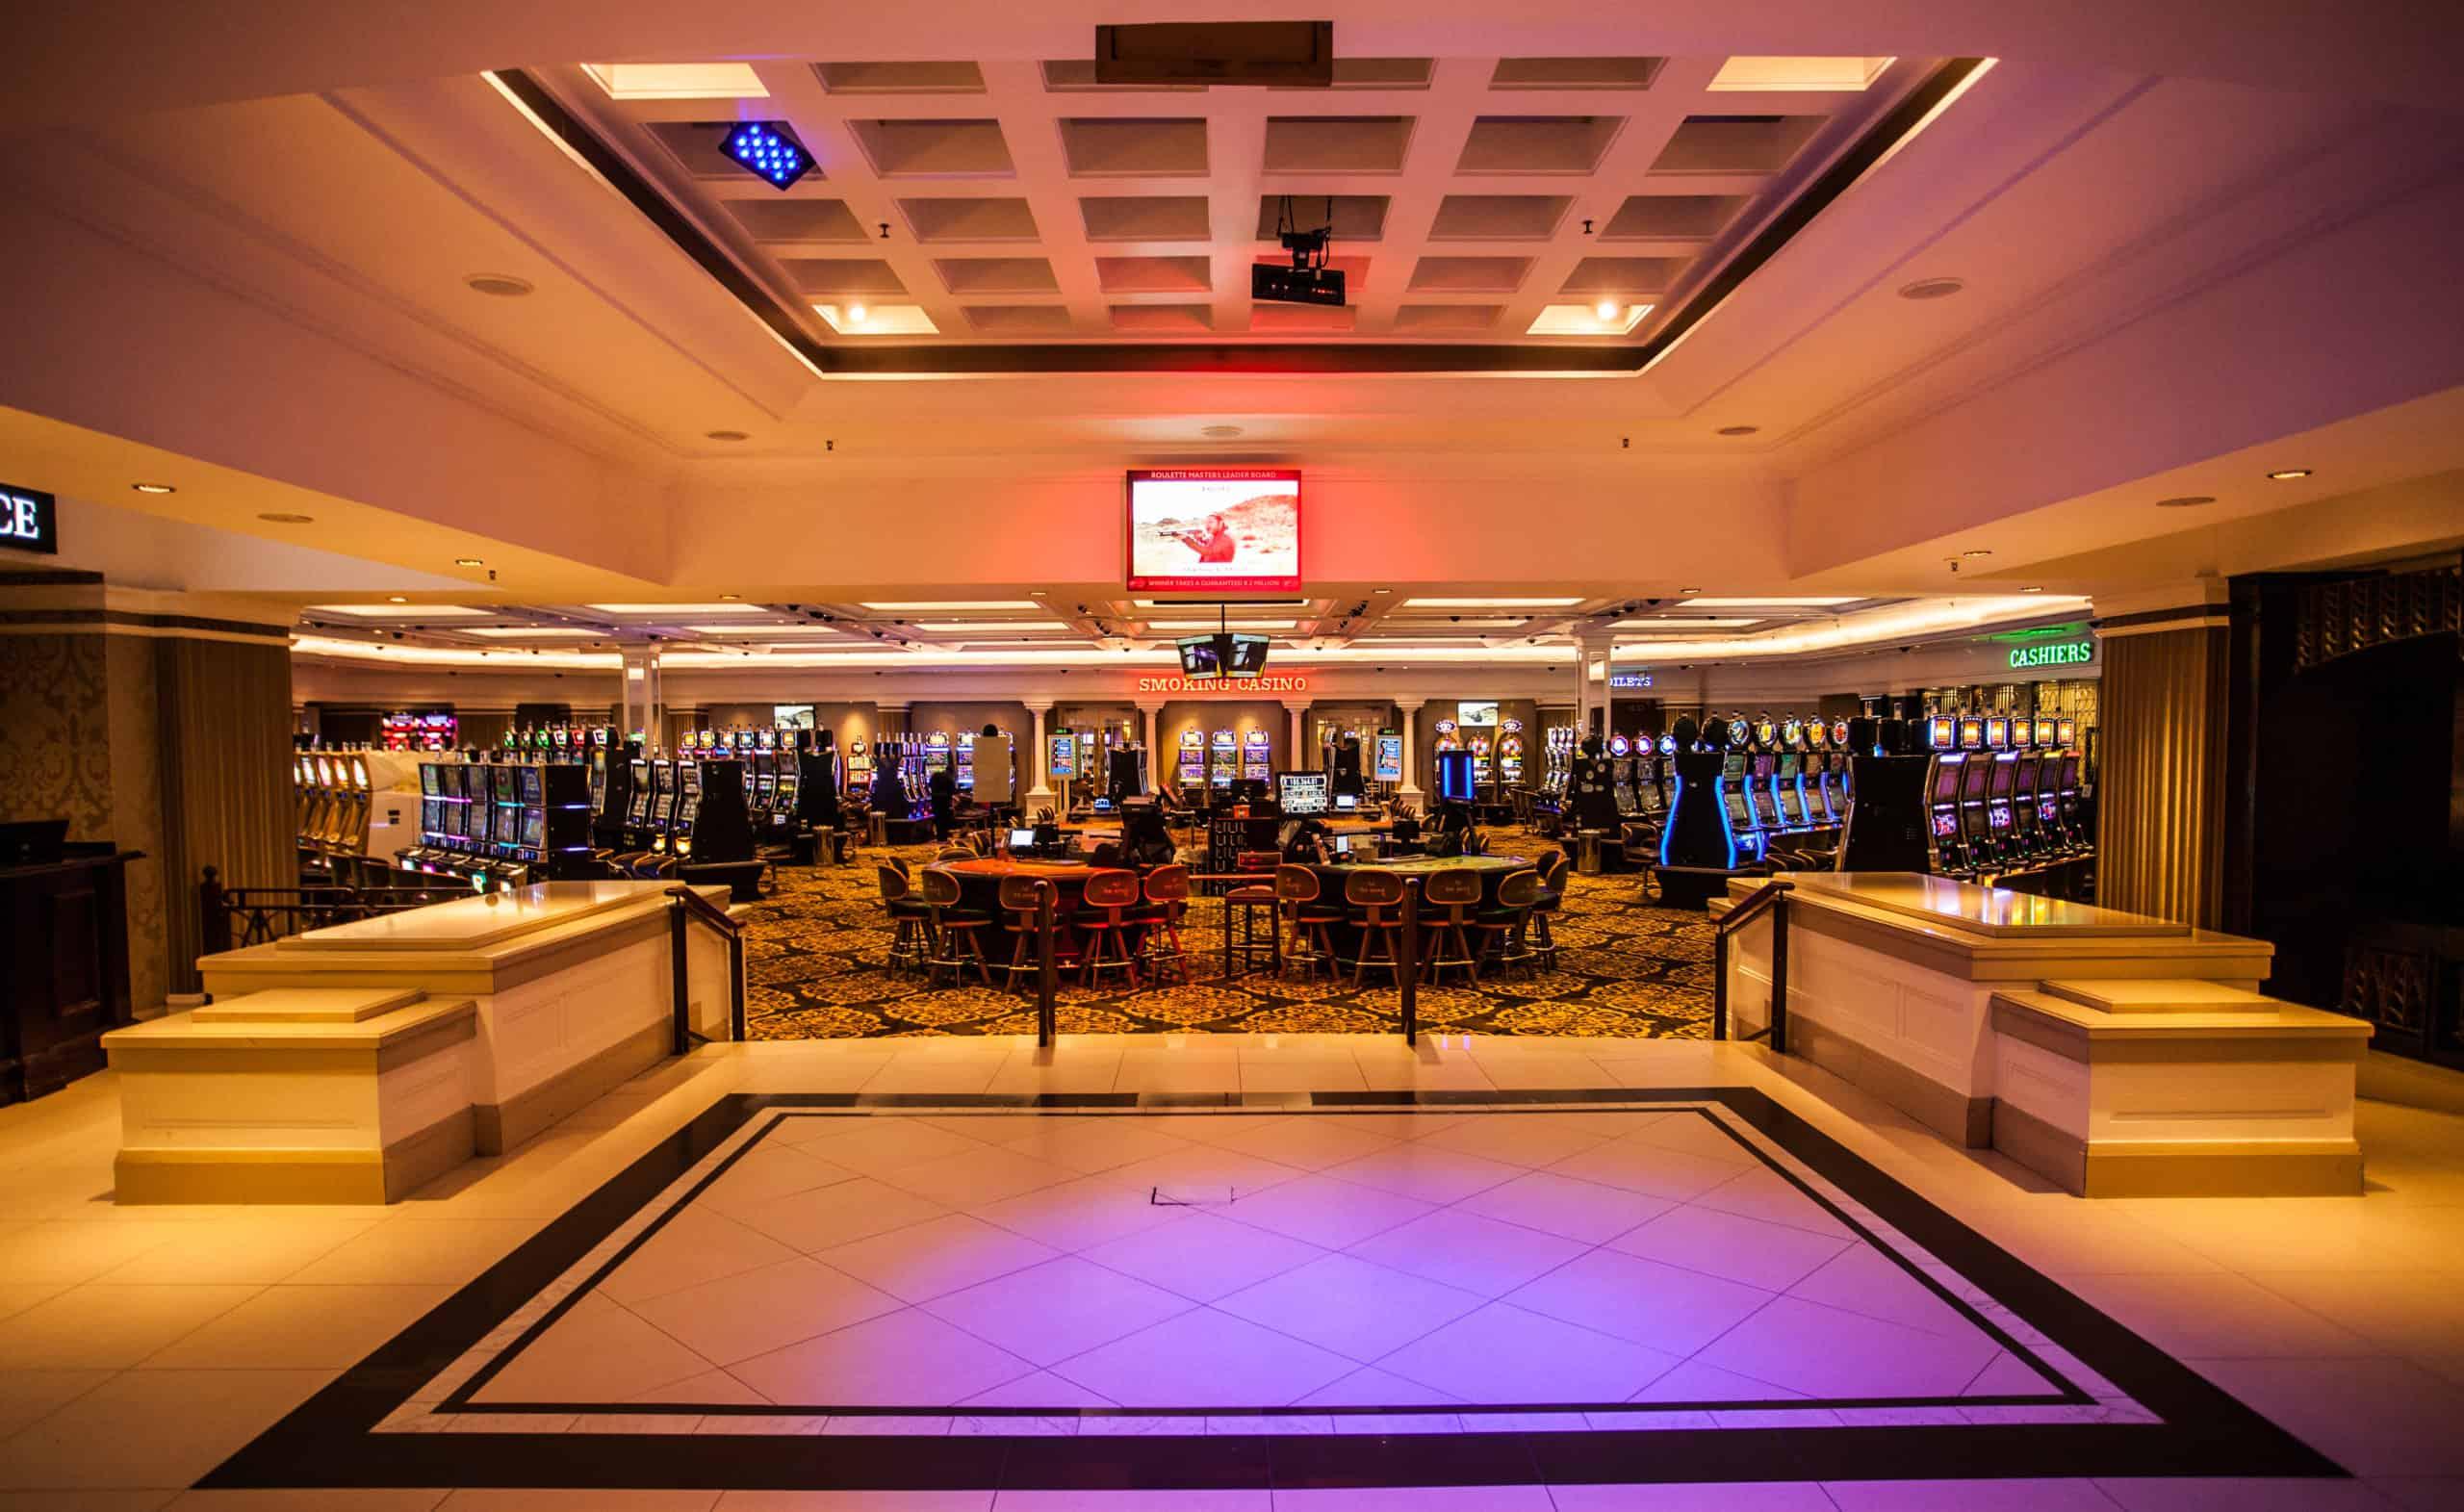 The Ridge Casino's gaming floor